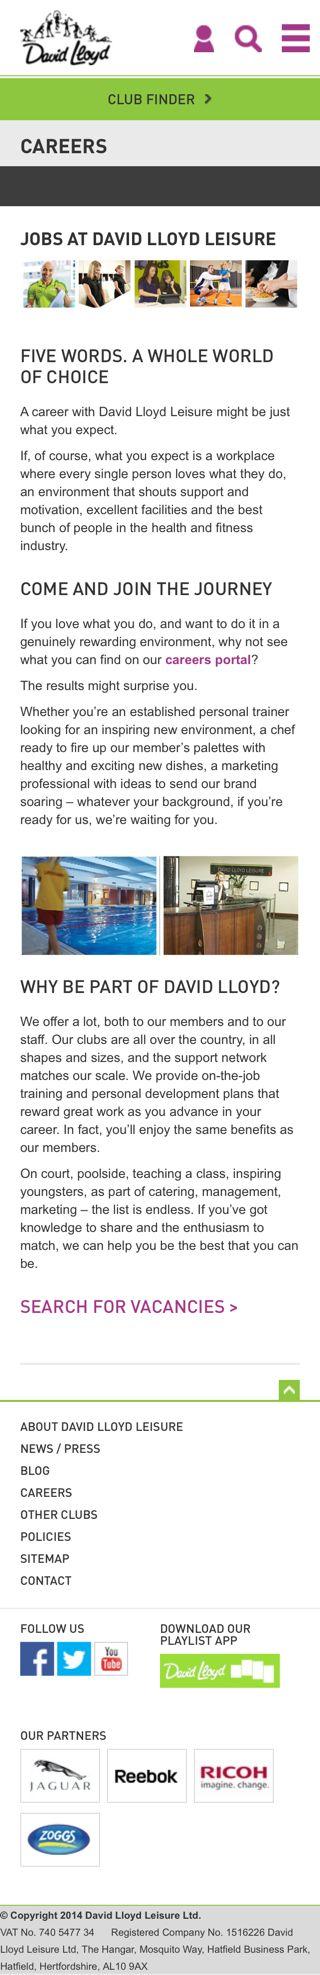 David Lloyd Leisure's mobile responsive candidate portal